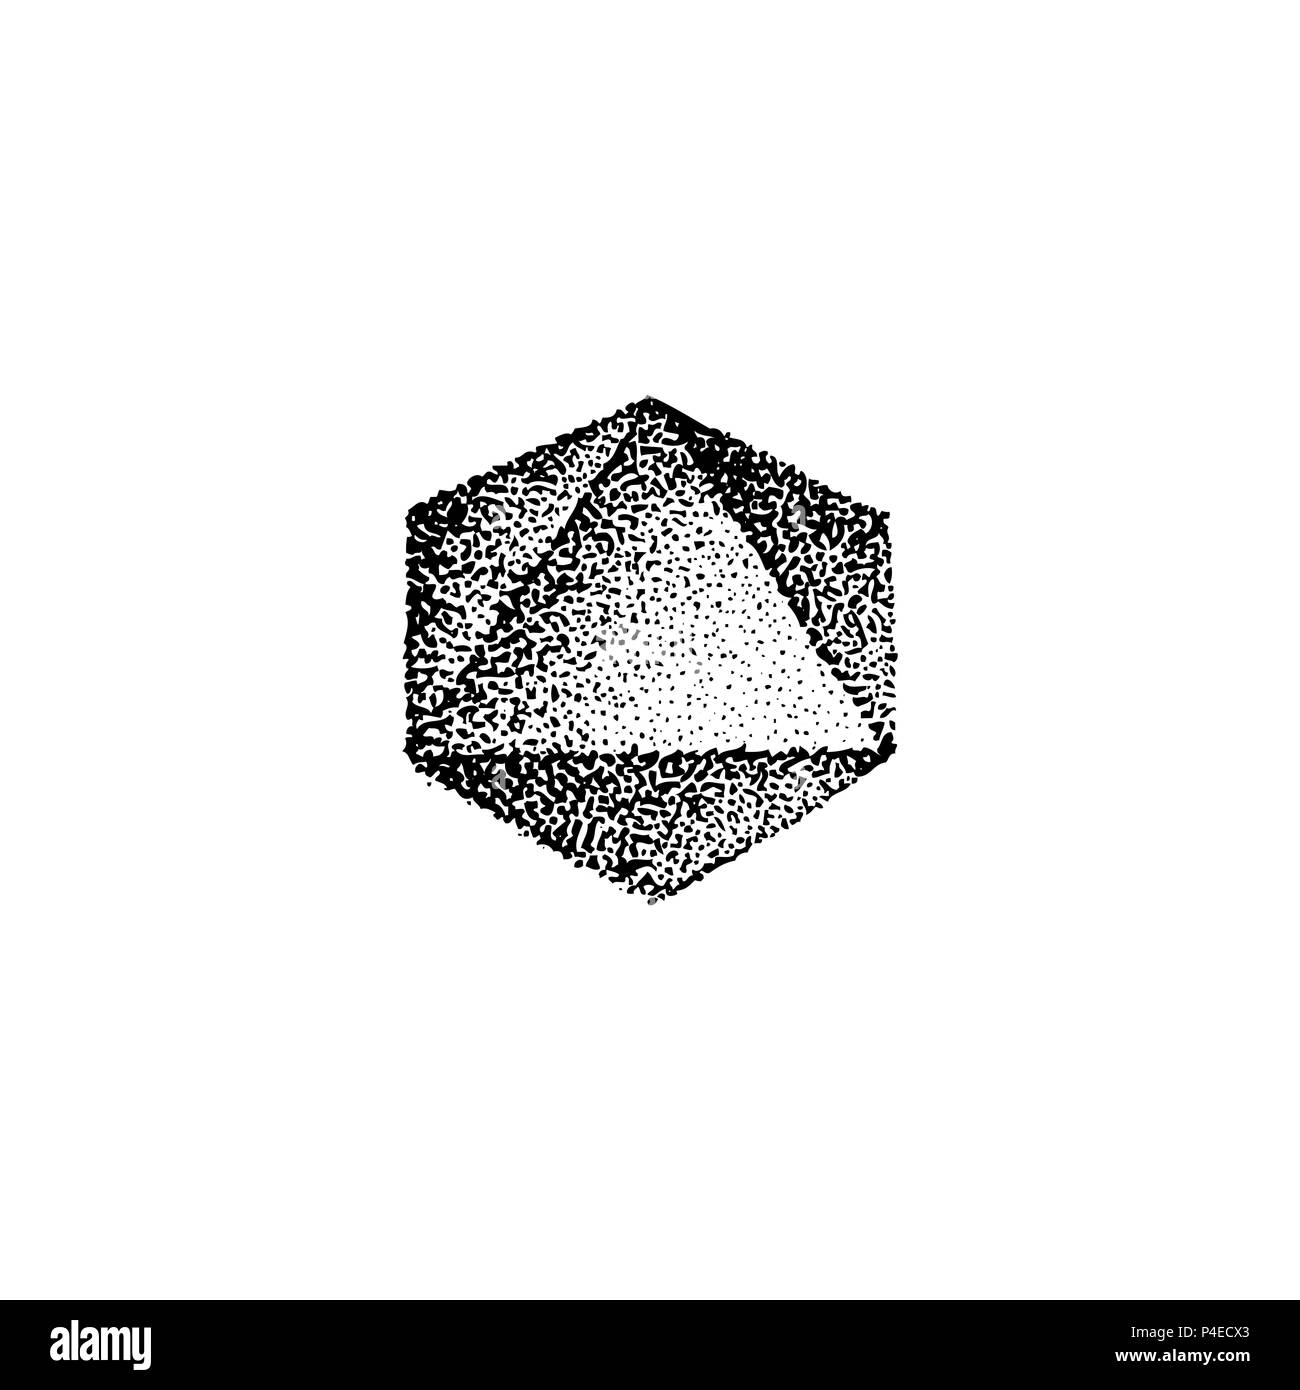 3afc335c69d79 vector monochrome black retro dot art hand drawn octahedron geometric  volumetric blackwork design element vintage tattoo